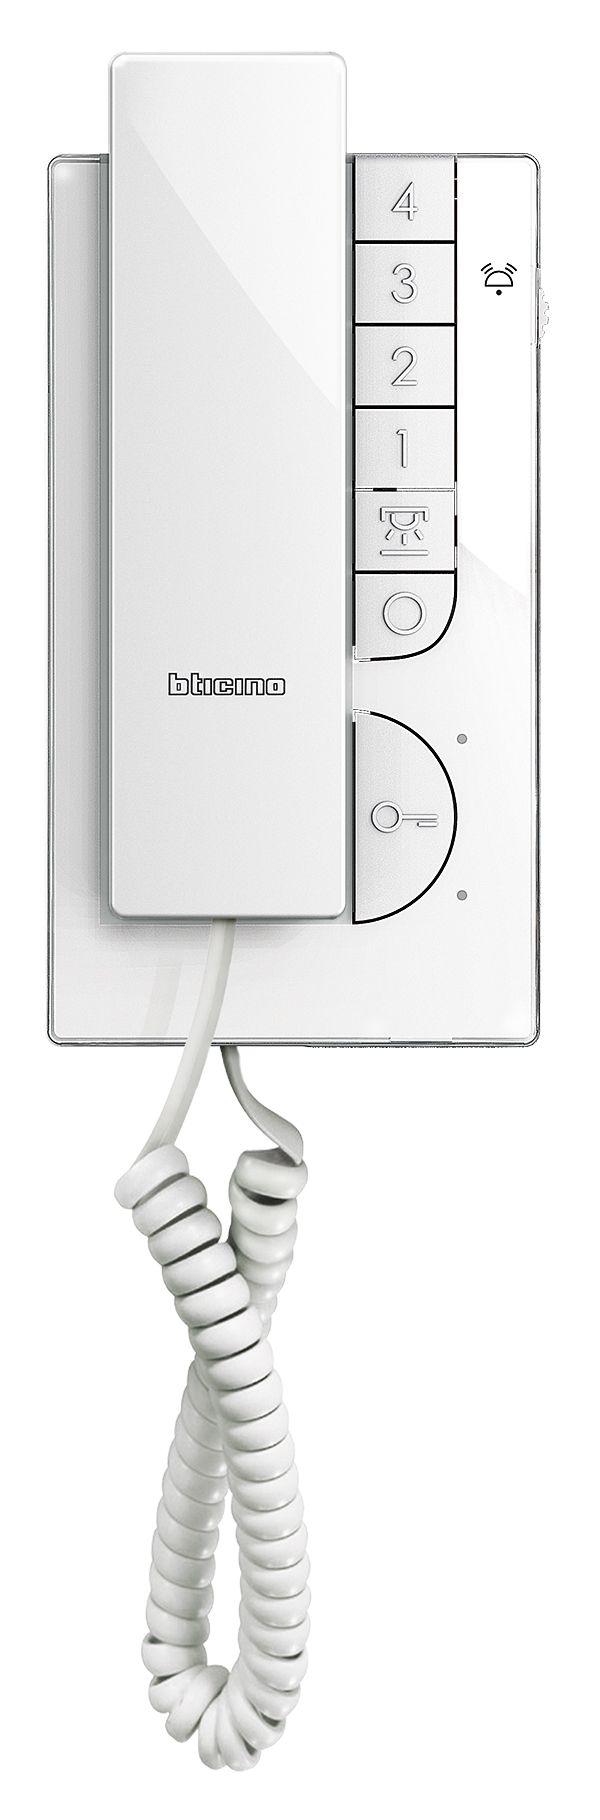 83 best Elektromaterial, Kabel images on Pinterest   Cable